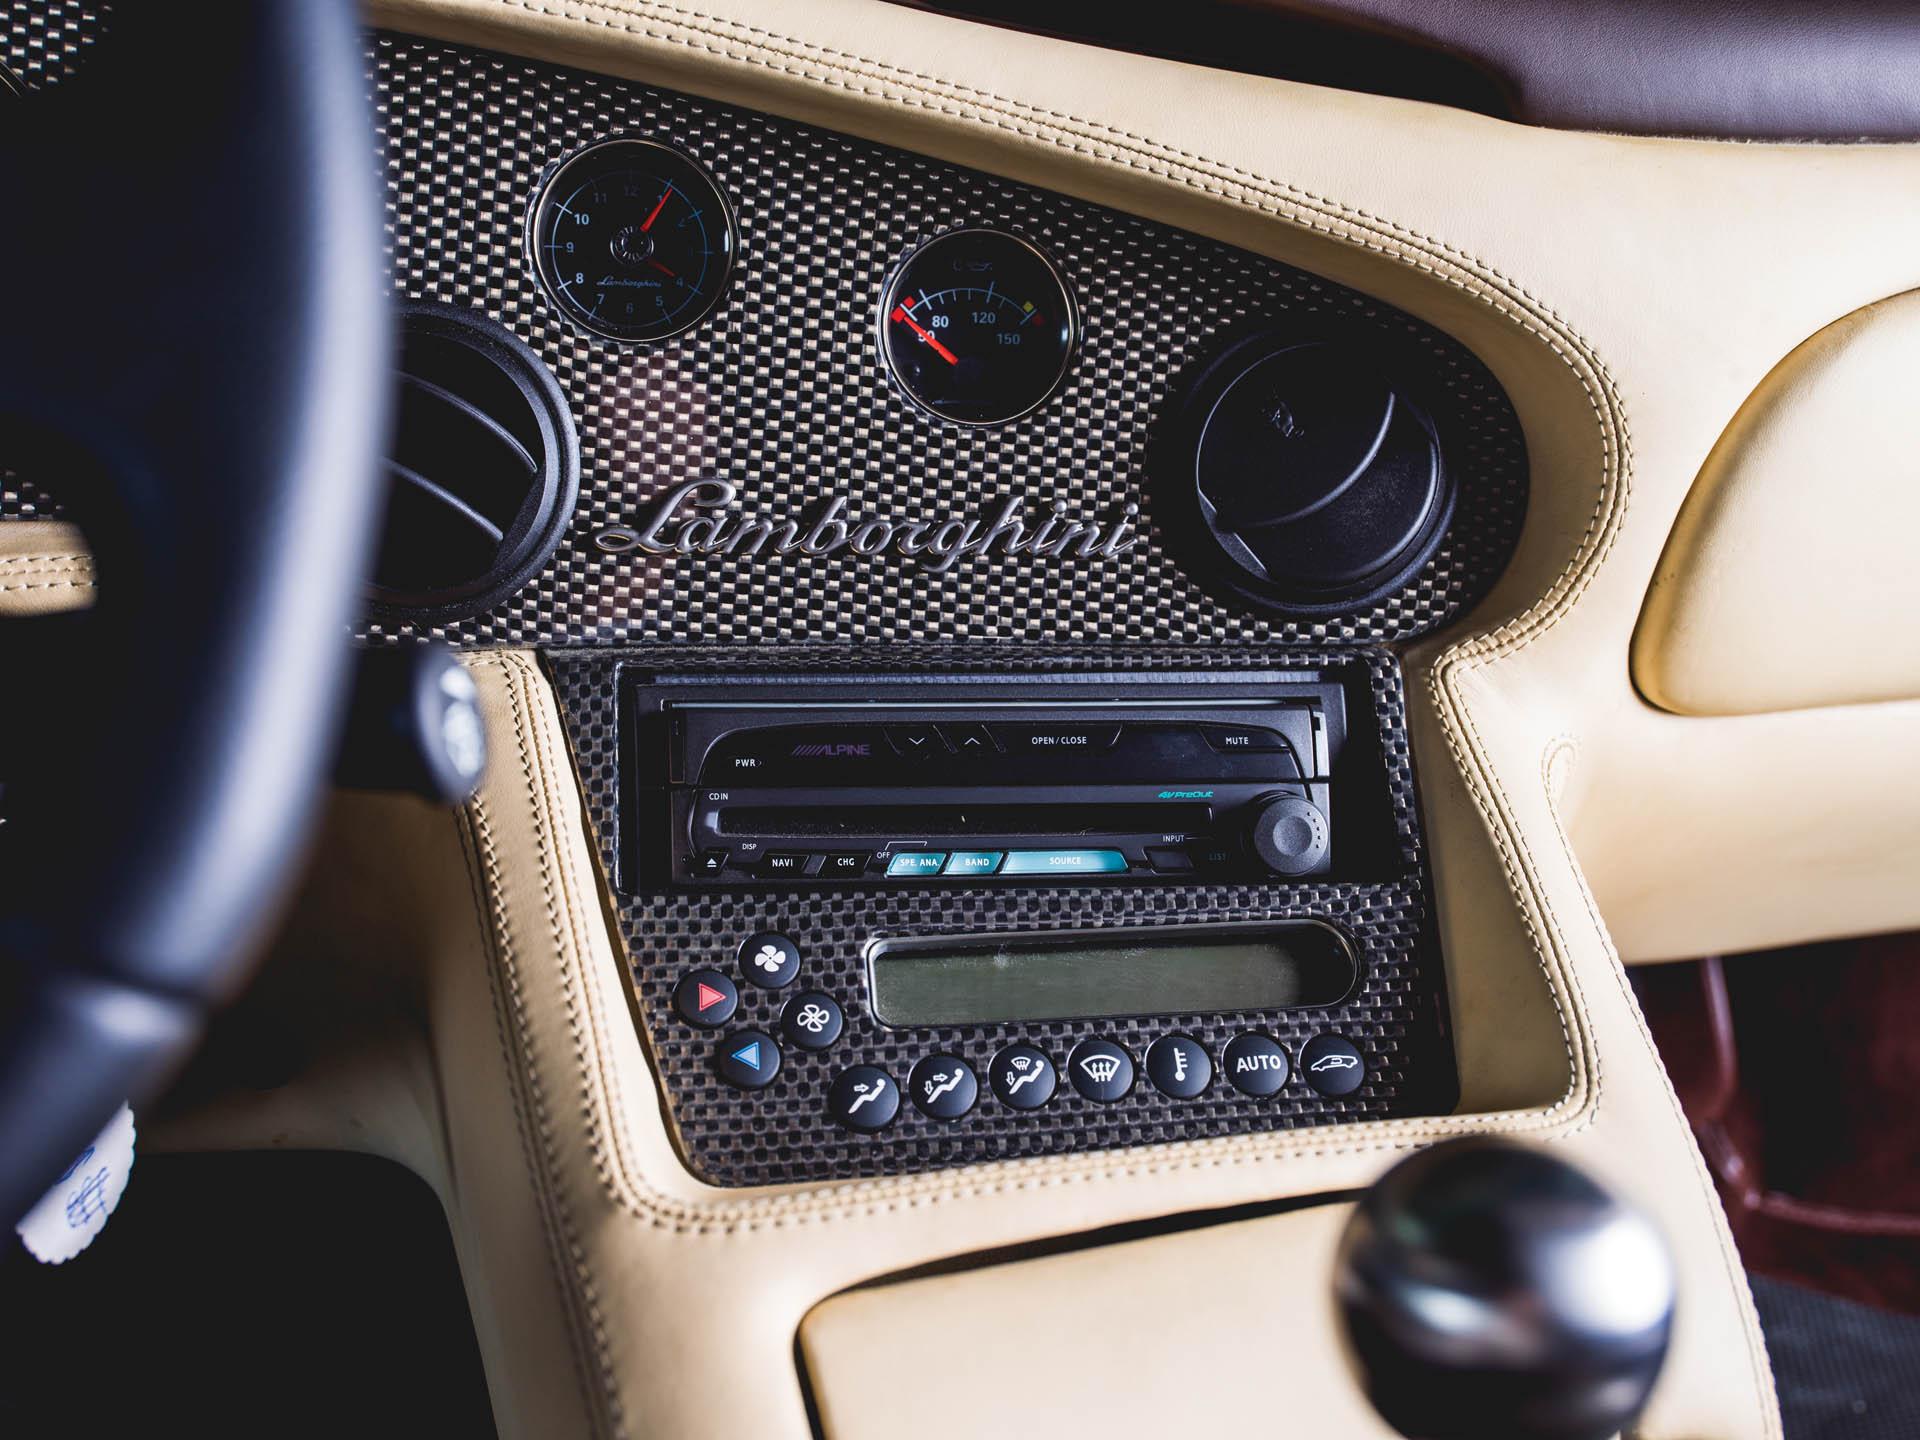 Index Of Wp Content Gallery 2018 Lamborghini Diablo Vt 6 0 Se For Sale